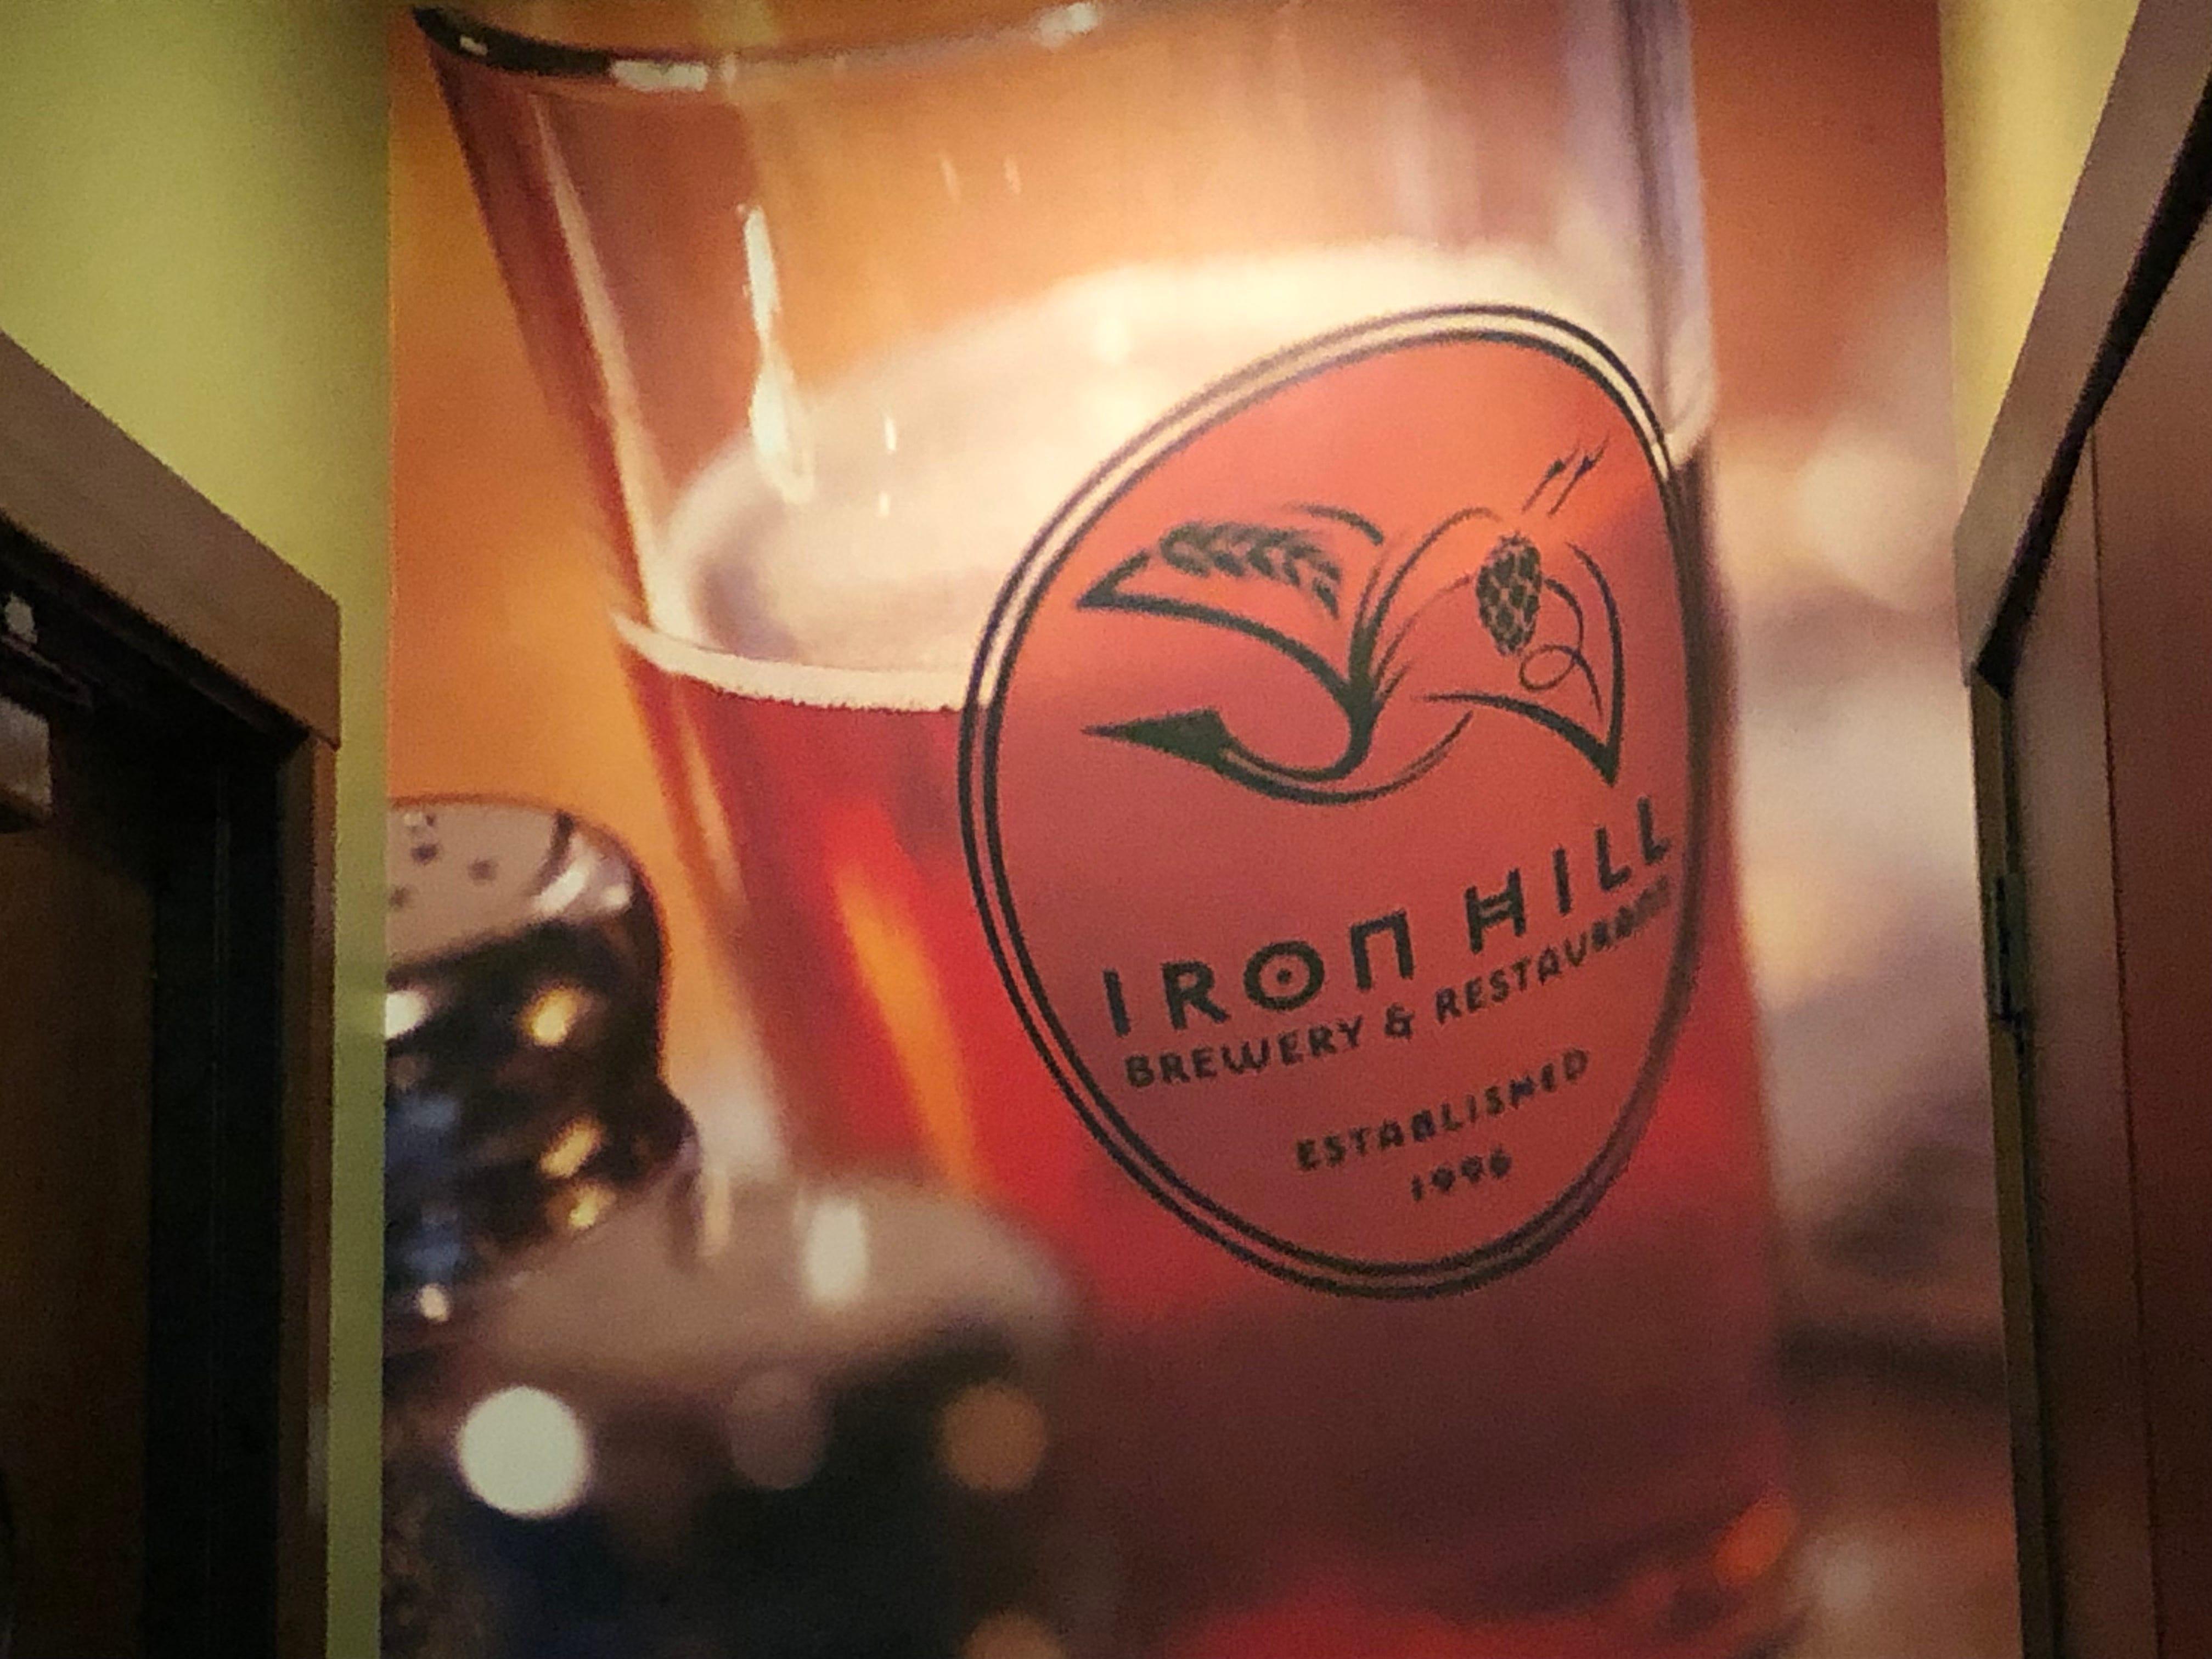 Iron Hill Brewery & Restaurant.